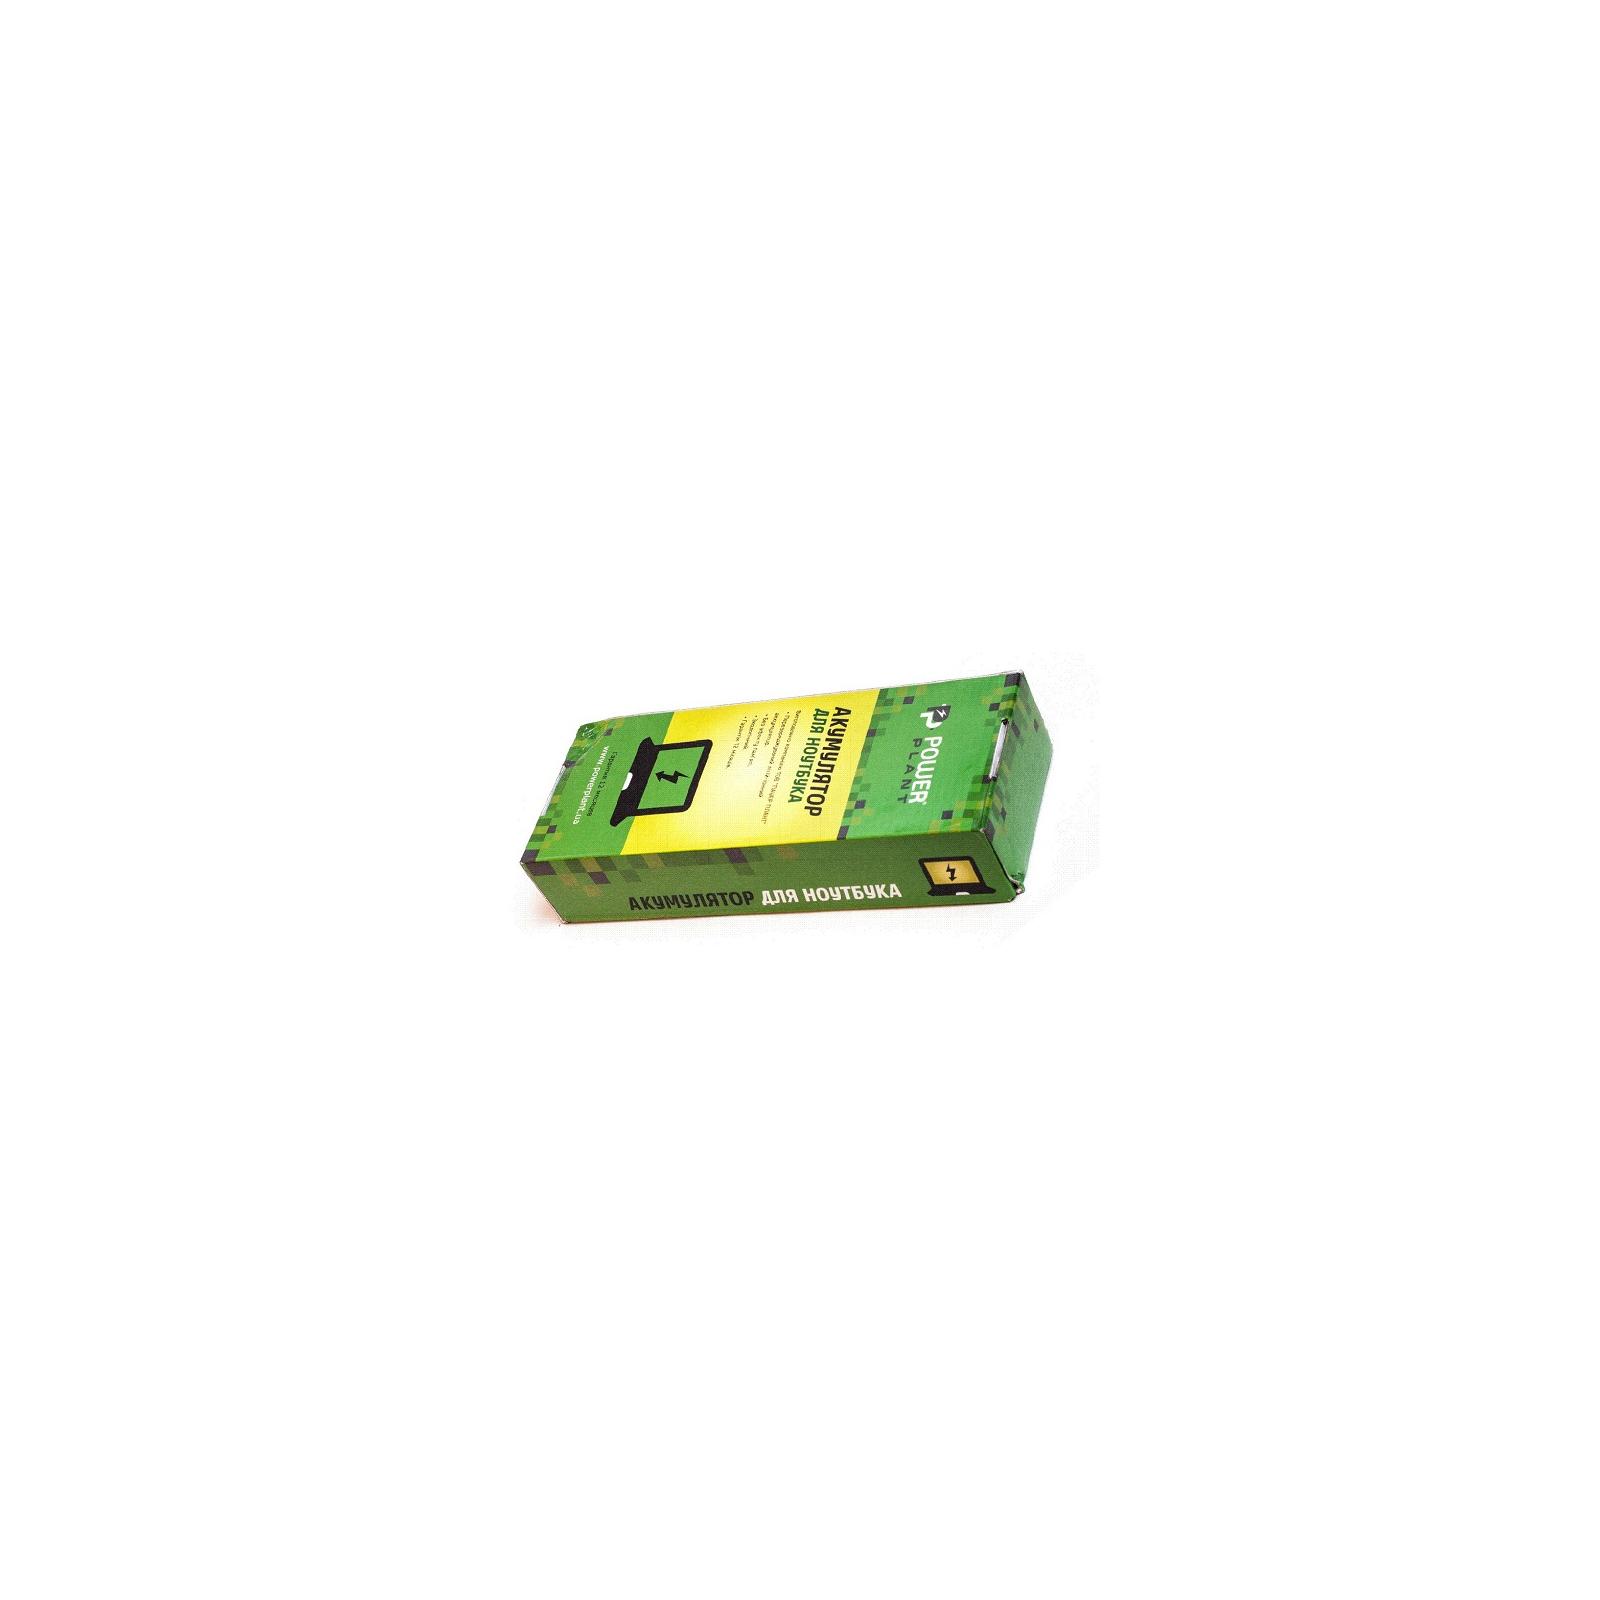 Аккумулятор для ноутбука HP 6720 (HSTNN-IB51, H6731 3S2P) 14.8V 5200mAh PowerPlant (NB00000148) изображение 3